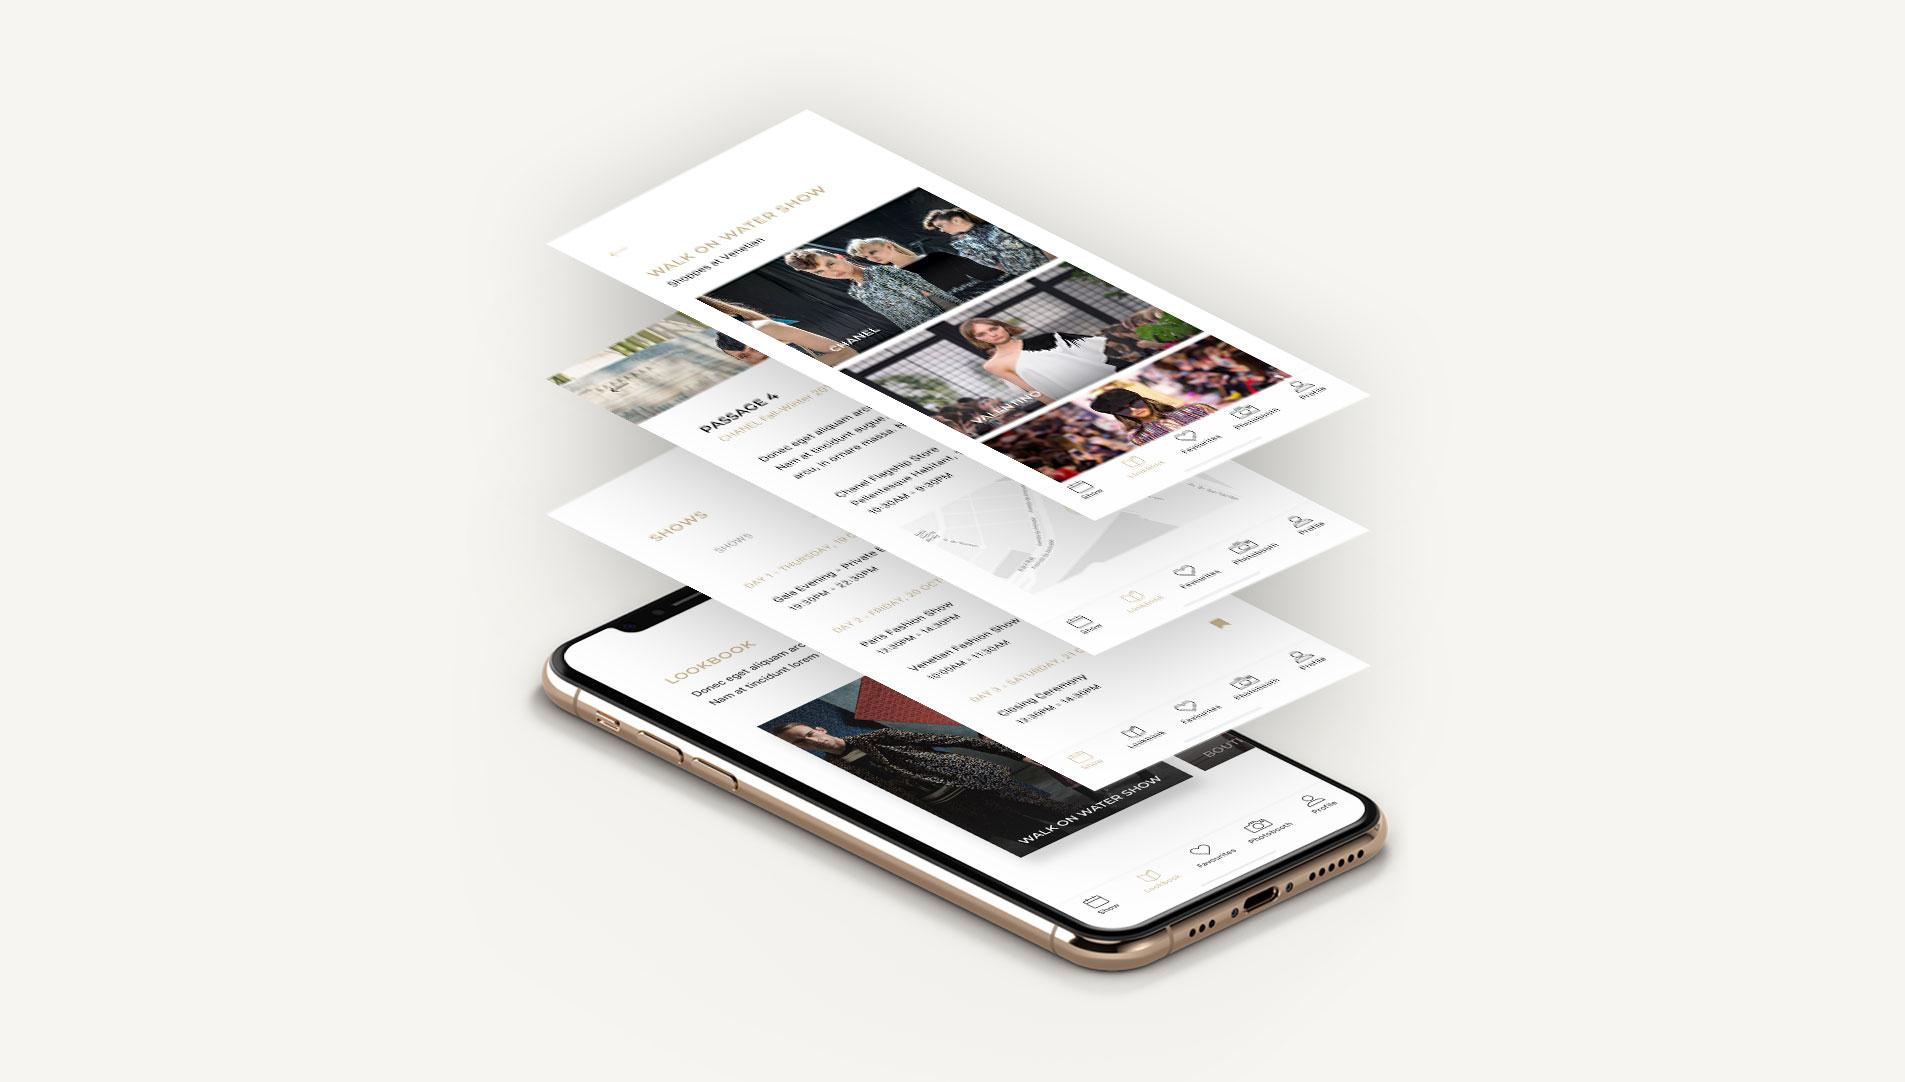 app development hk SMFW slideshow 02